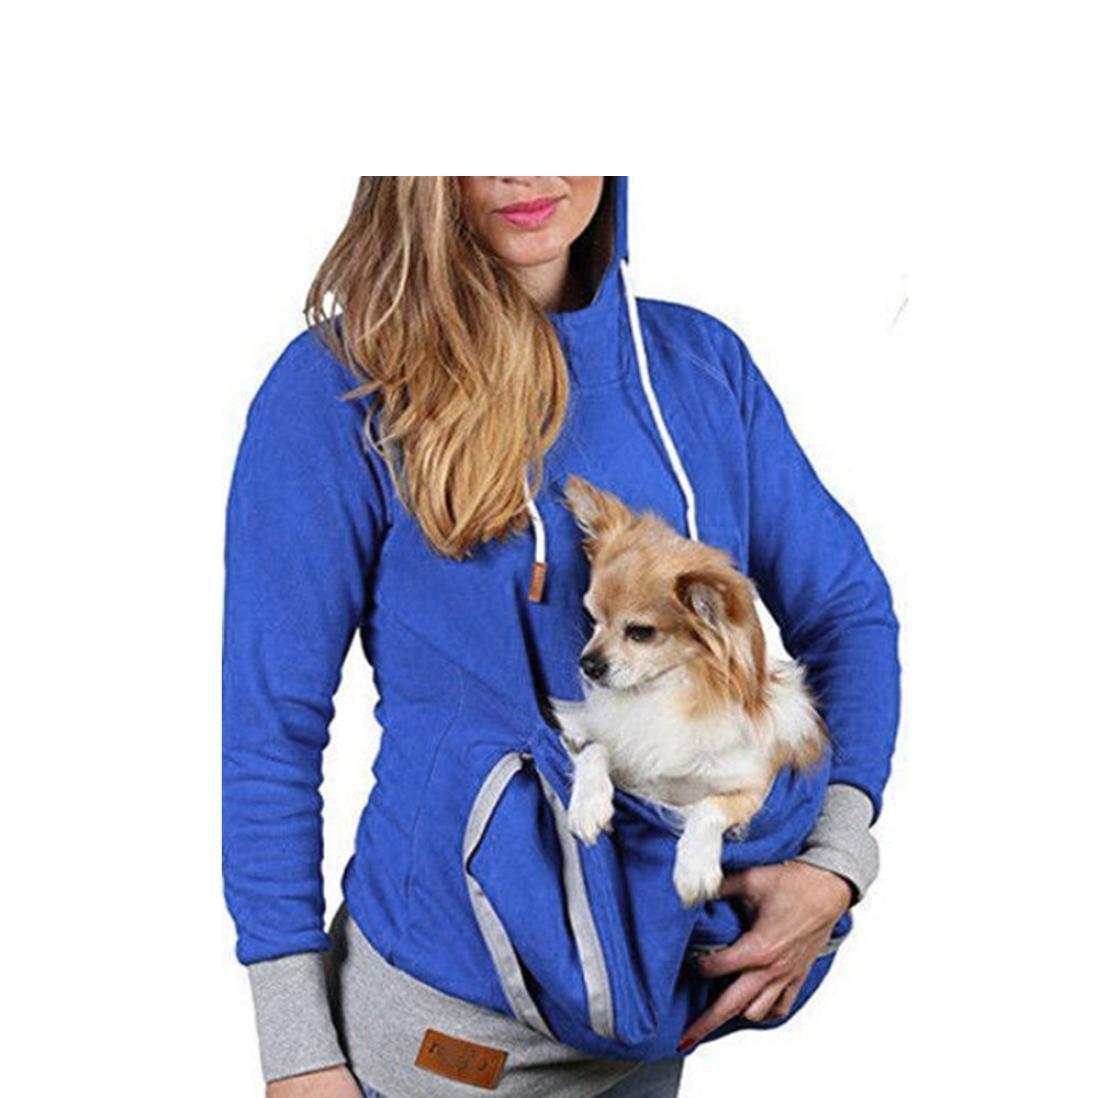 PET LOVE SERIES Unisex Big Pocket Pet Cat Carriers Pullover,[Pet Holder] Casual Sweatshirts [Kangaroo Pouch Hoodies Sweater] (L2, Blue)